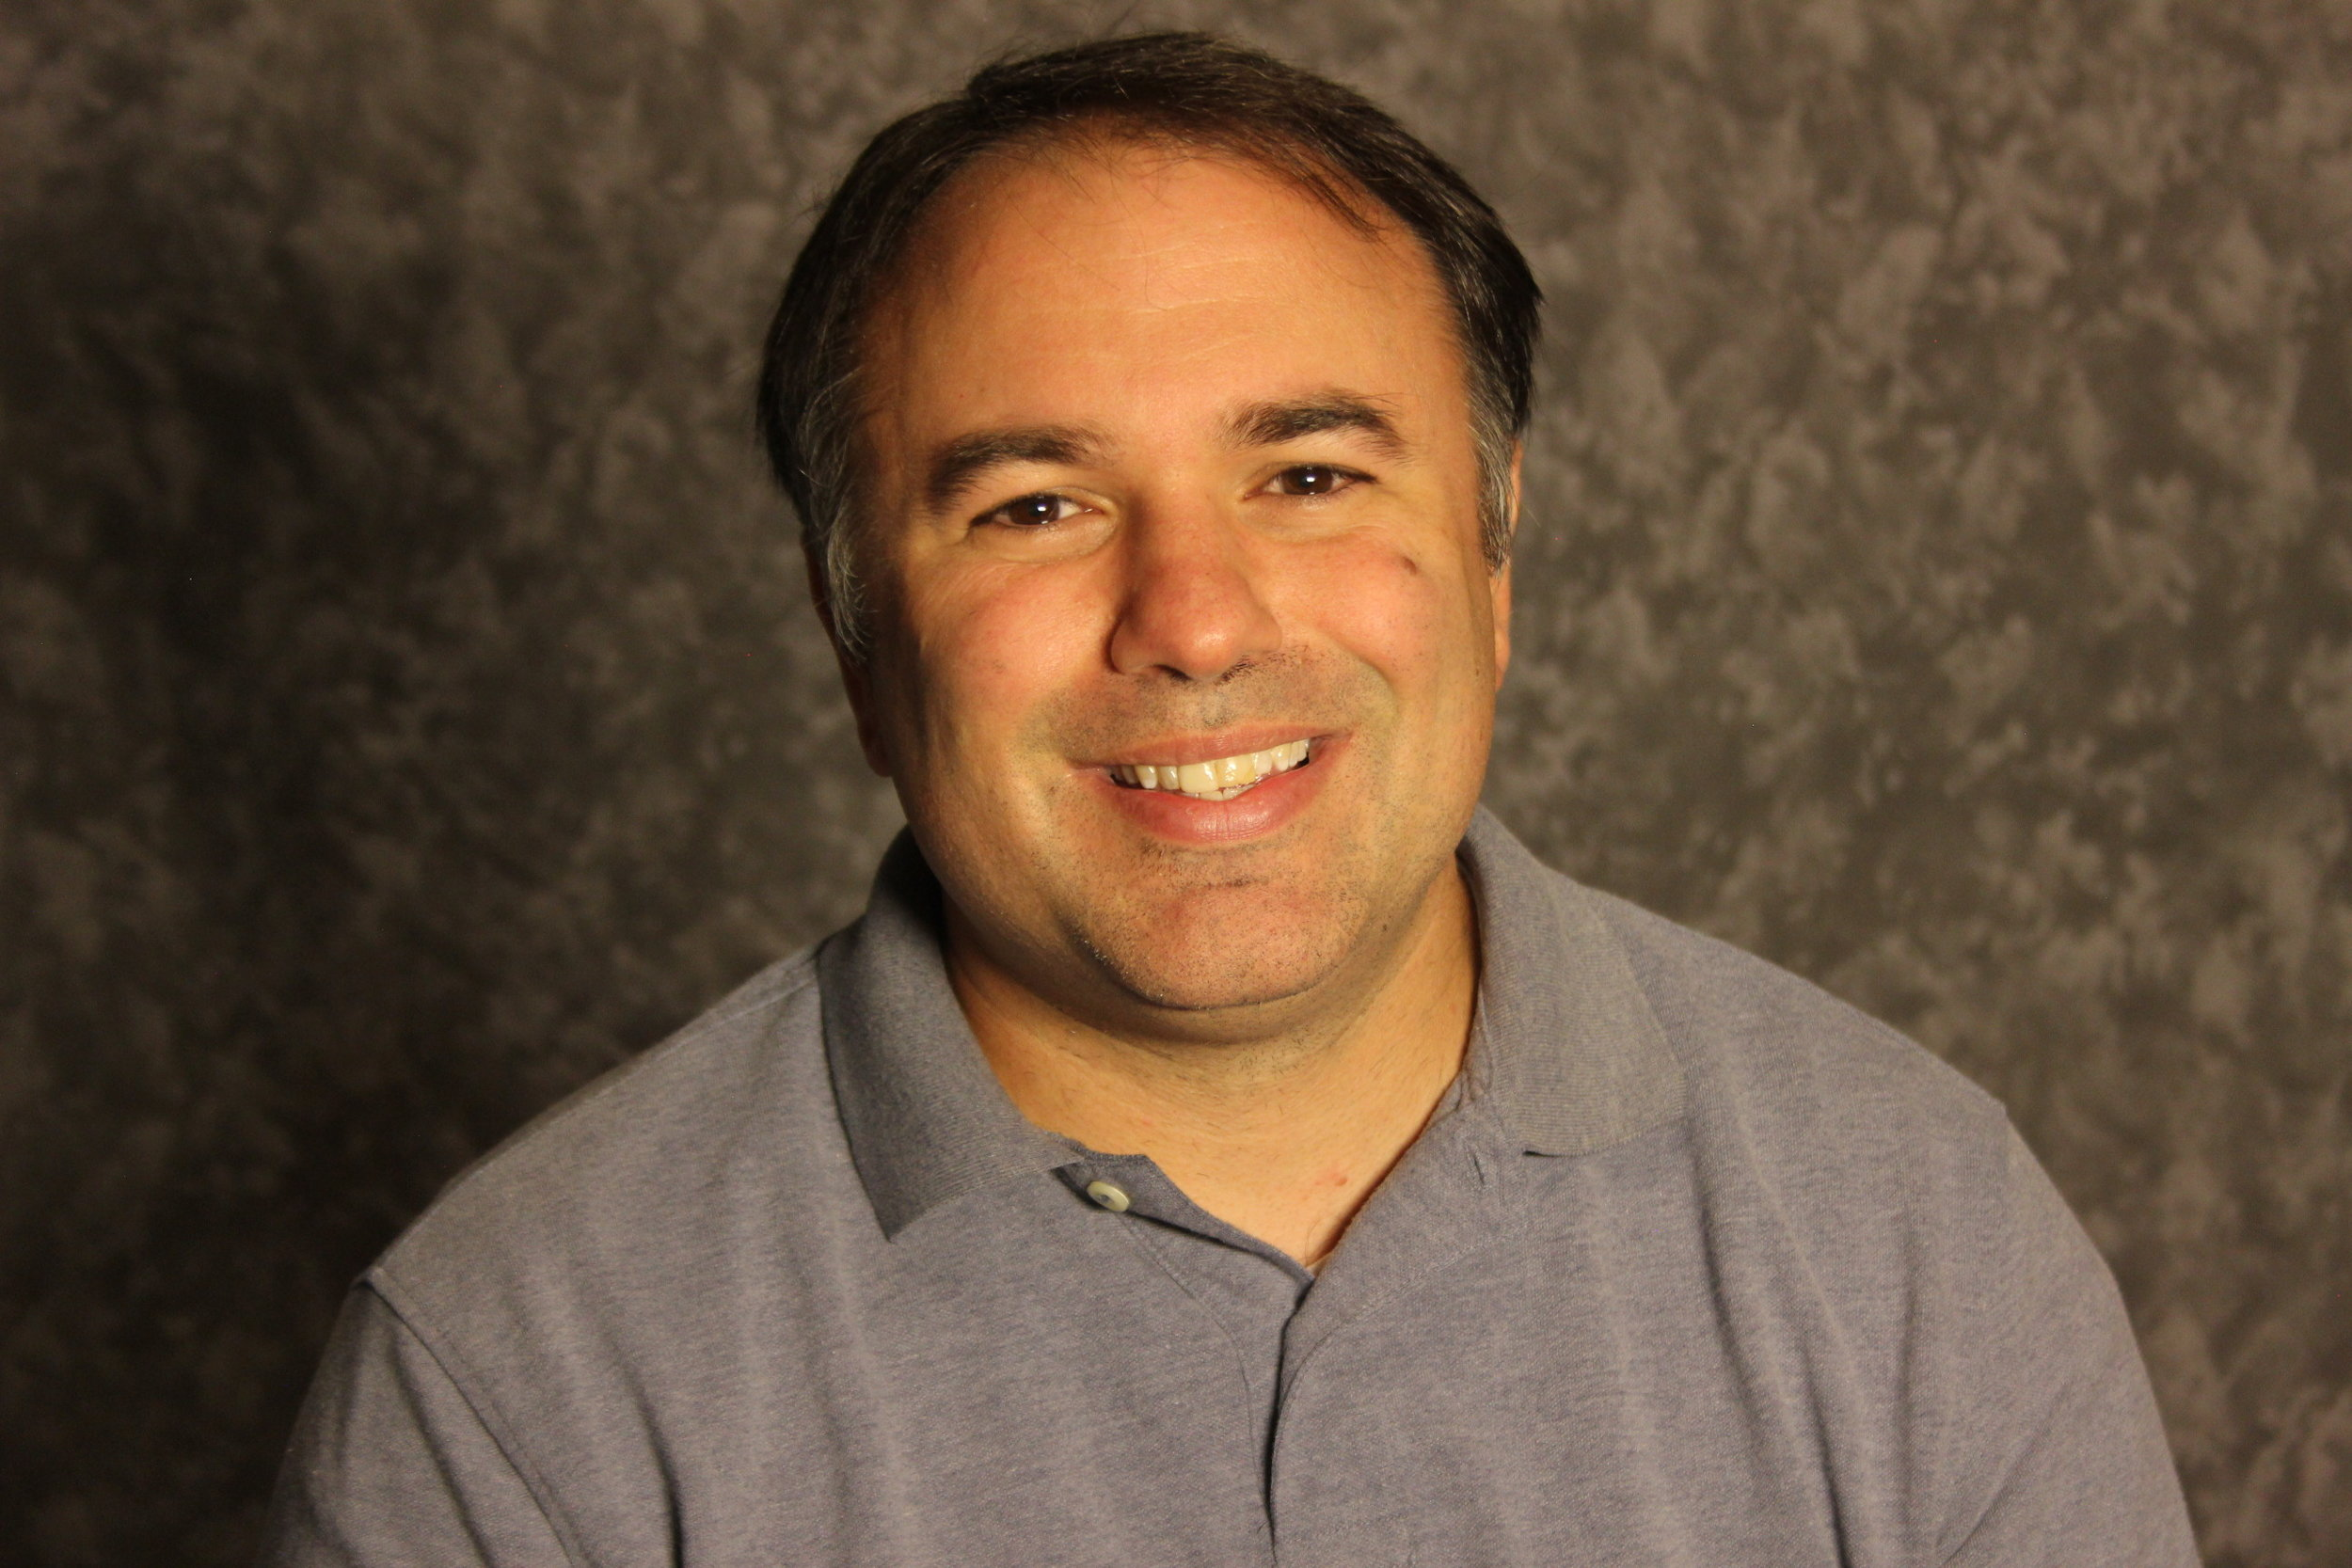 Ryan Boni, Public Access Director